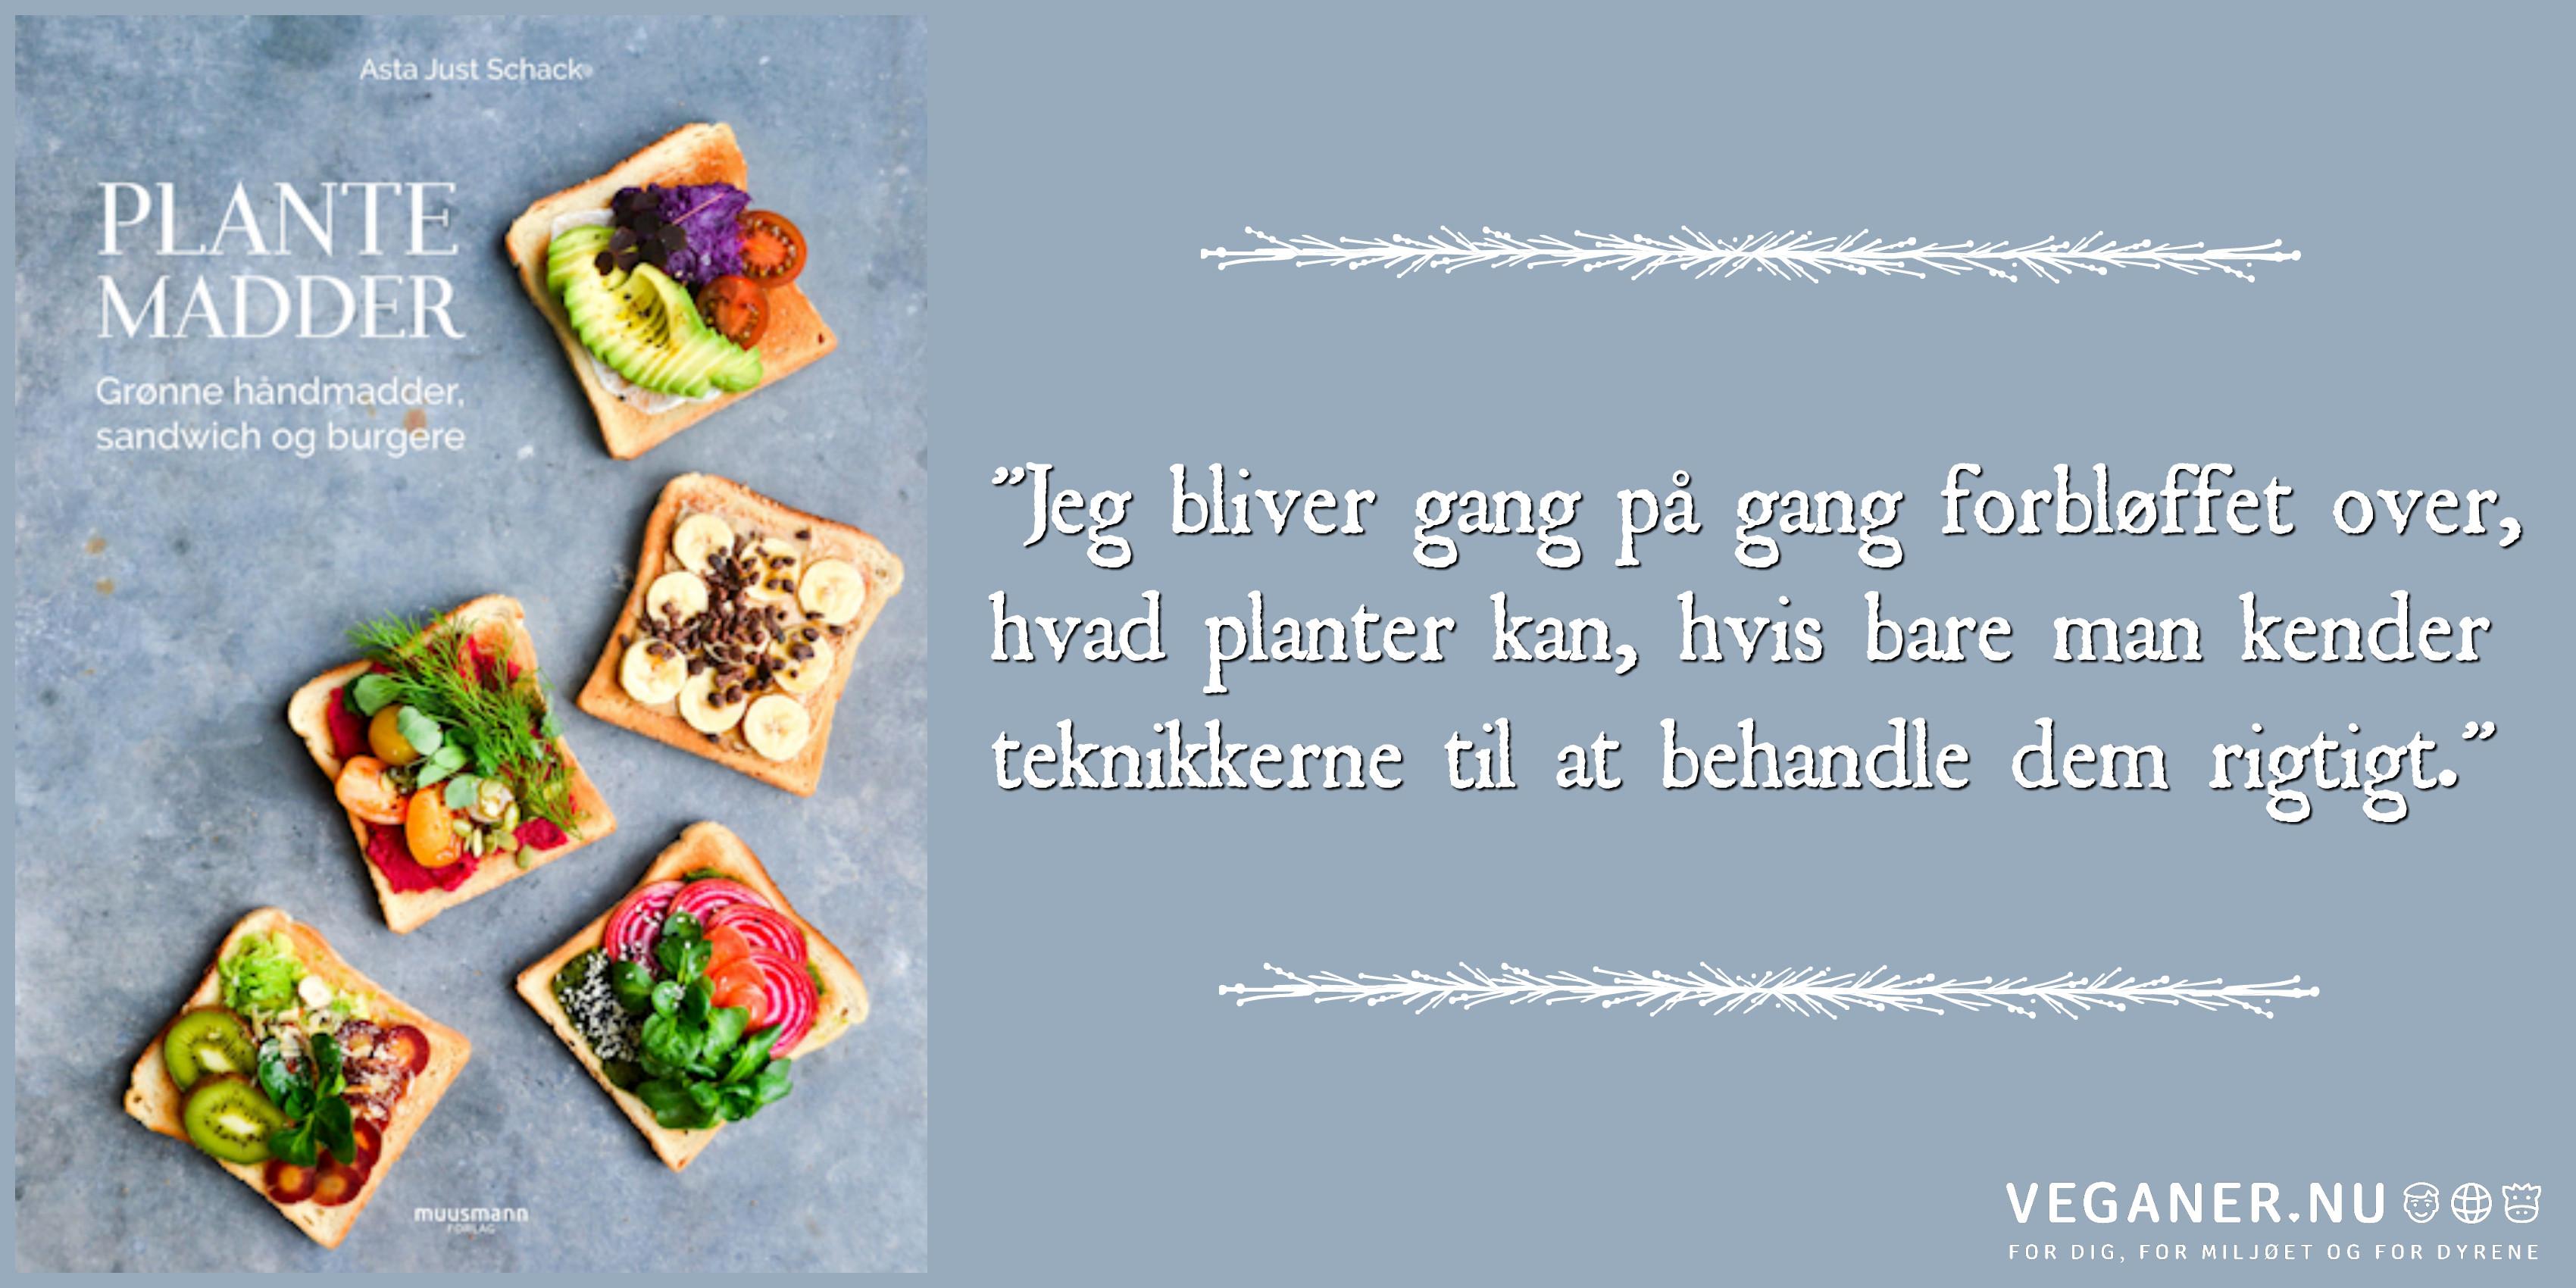 Veganer.nu-plantemadder